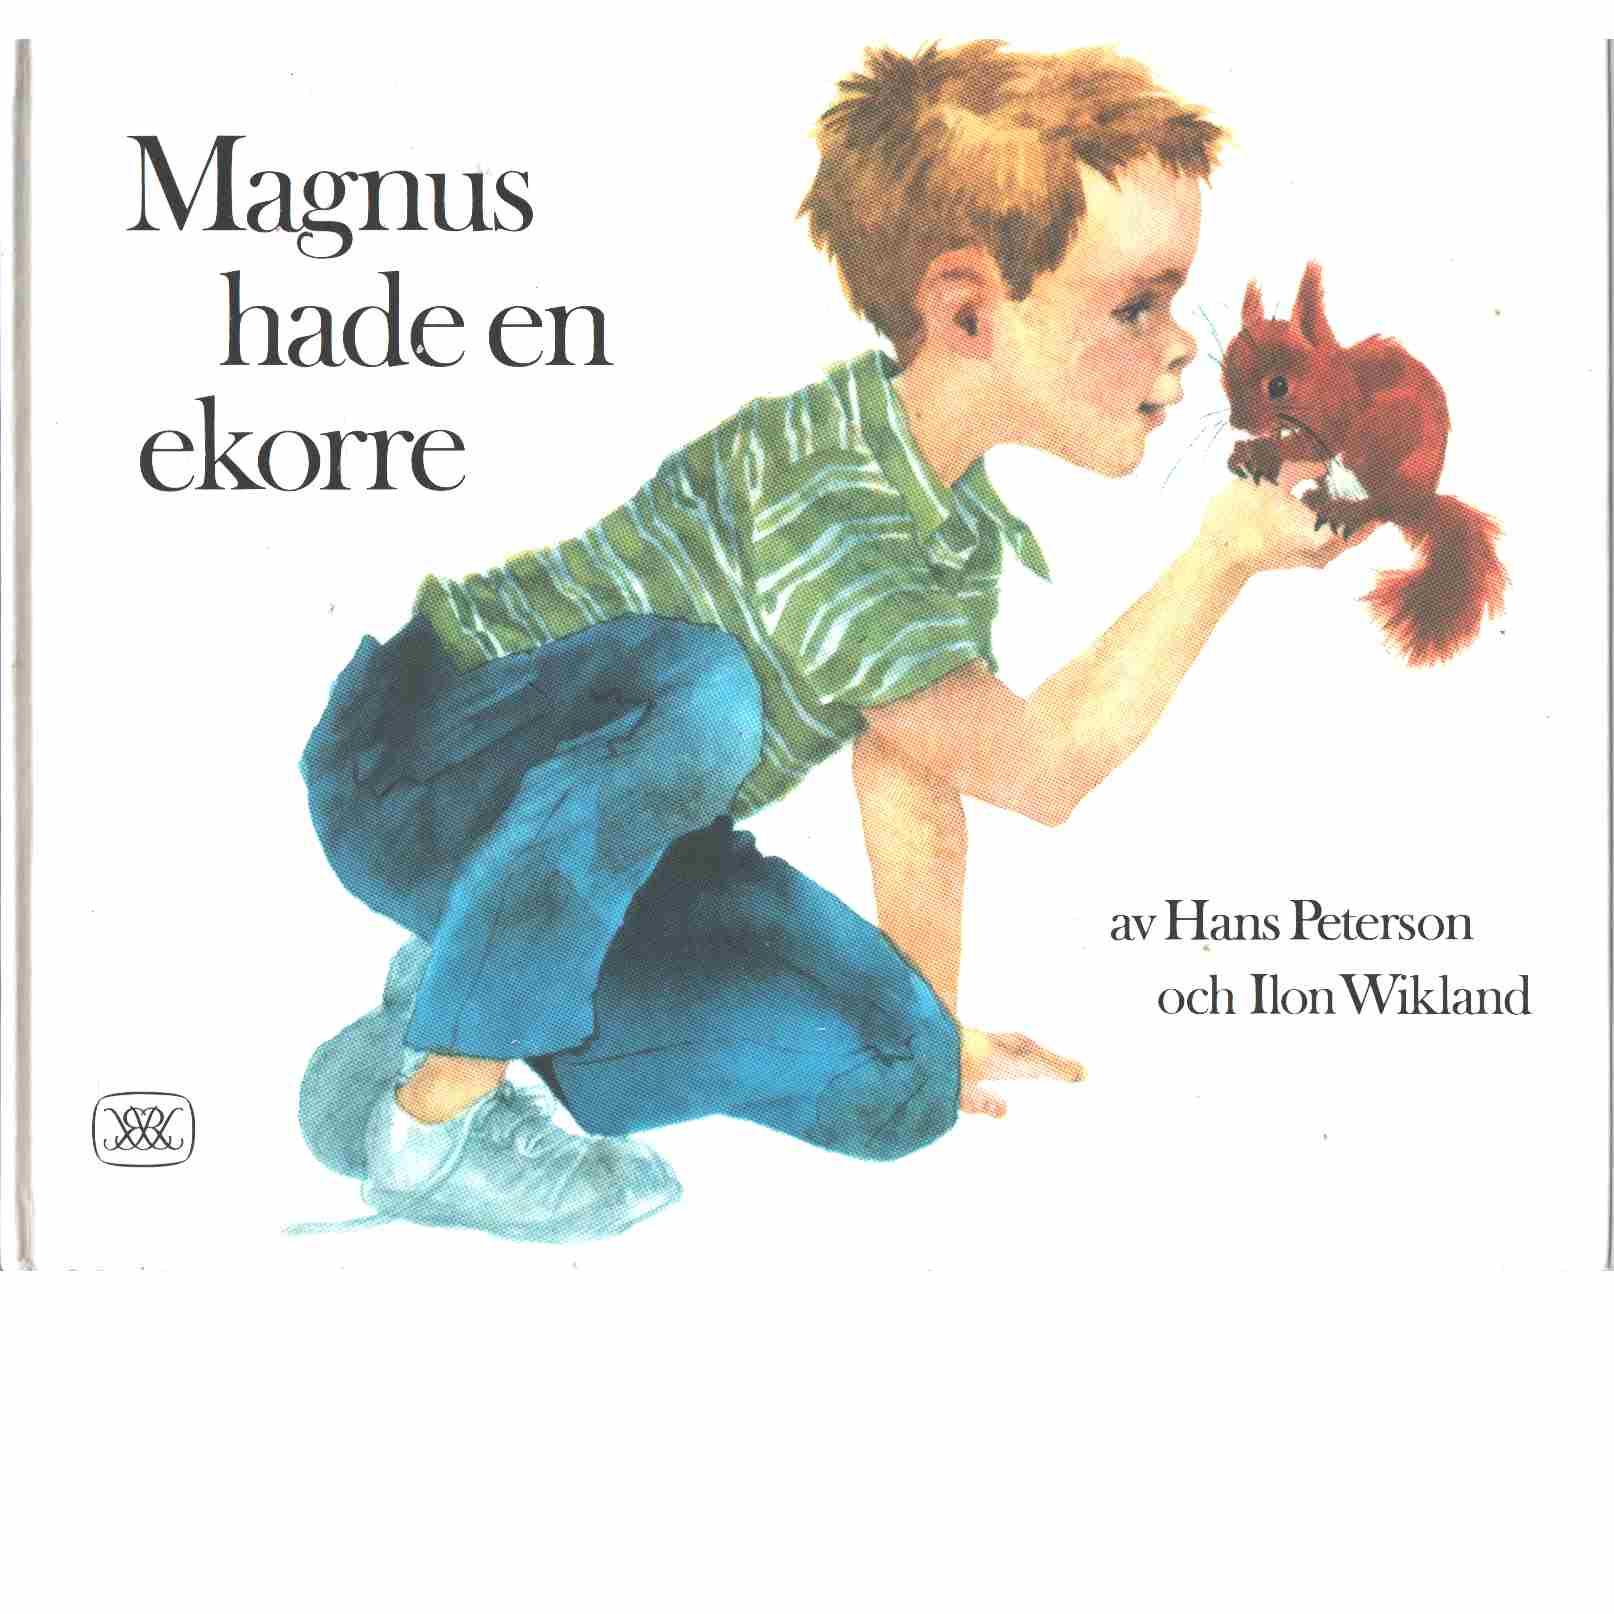 Magnus hade en ekorre  - Peterson, Hans och Wikland, Ilon